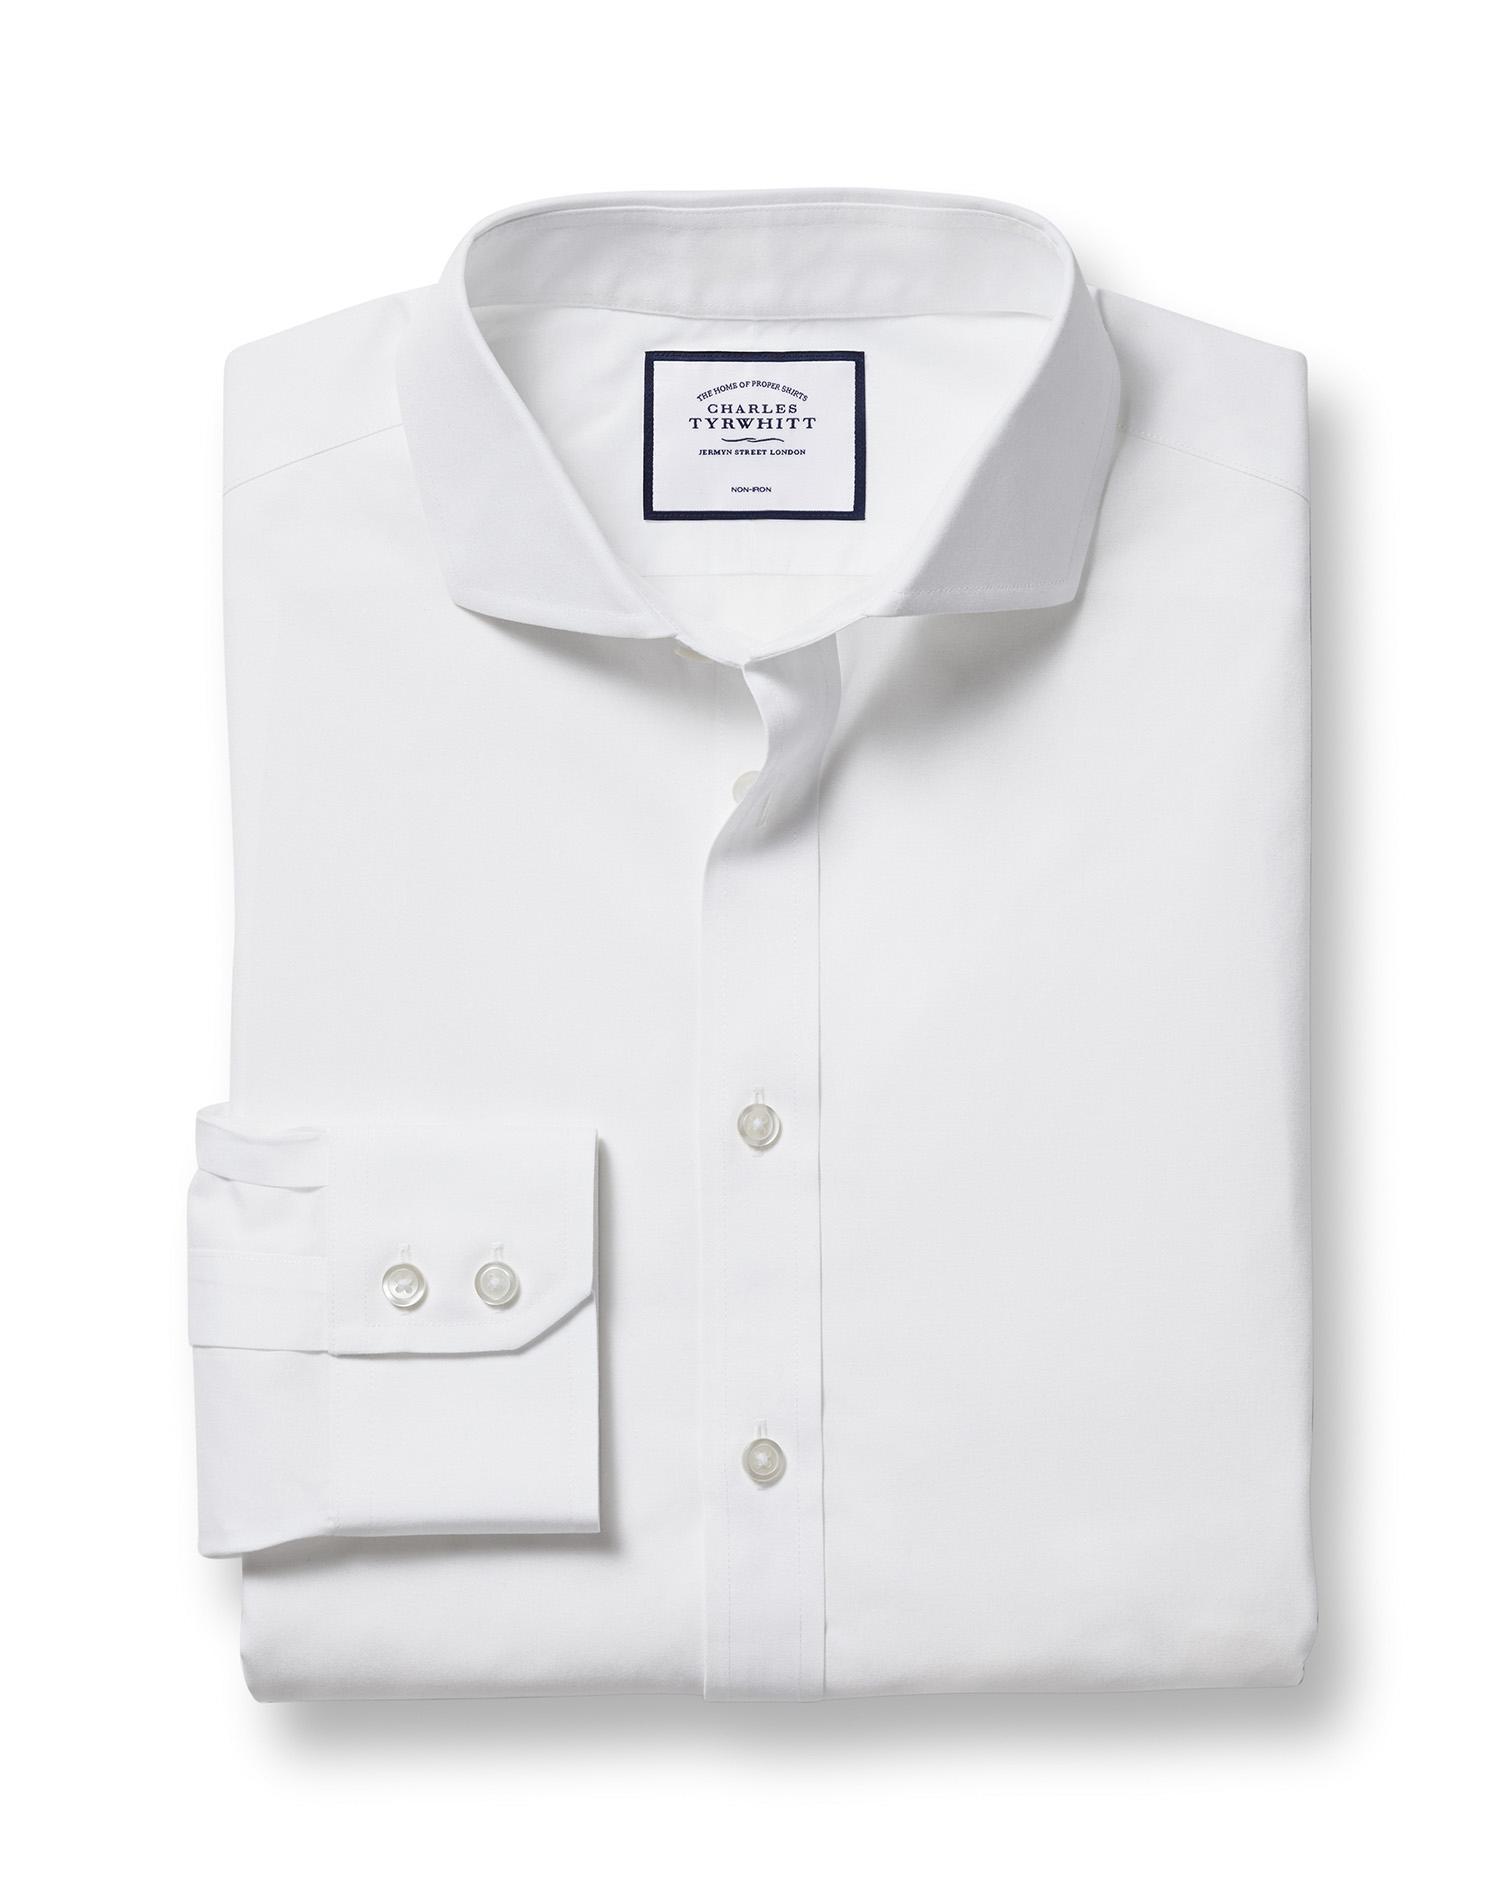 Slim Fit White Non-Iron Poplin Cutaway Collar Cotton Formal Shirt Single Cuff Size 17/37 by Charles